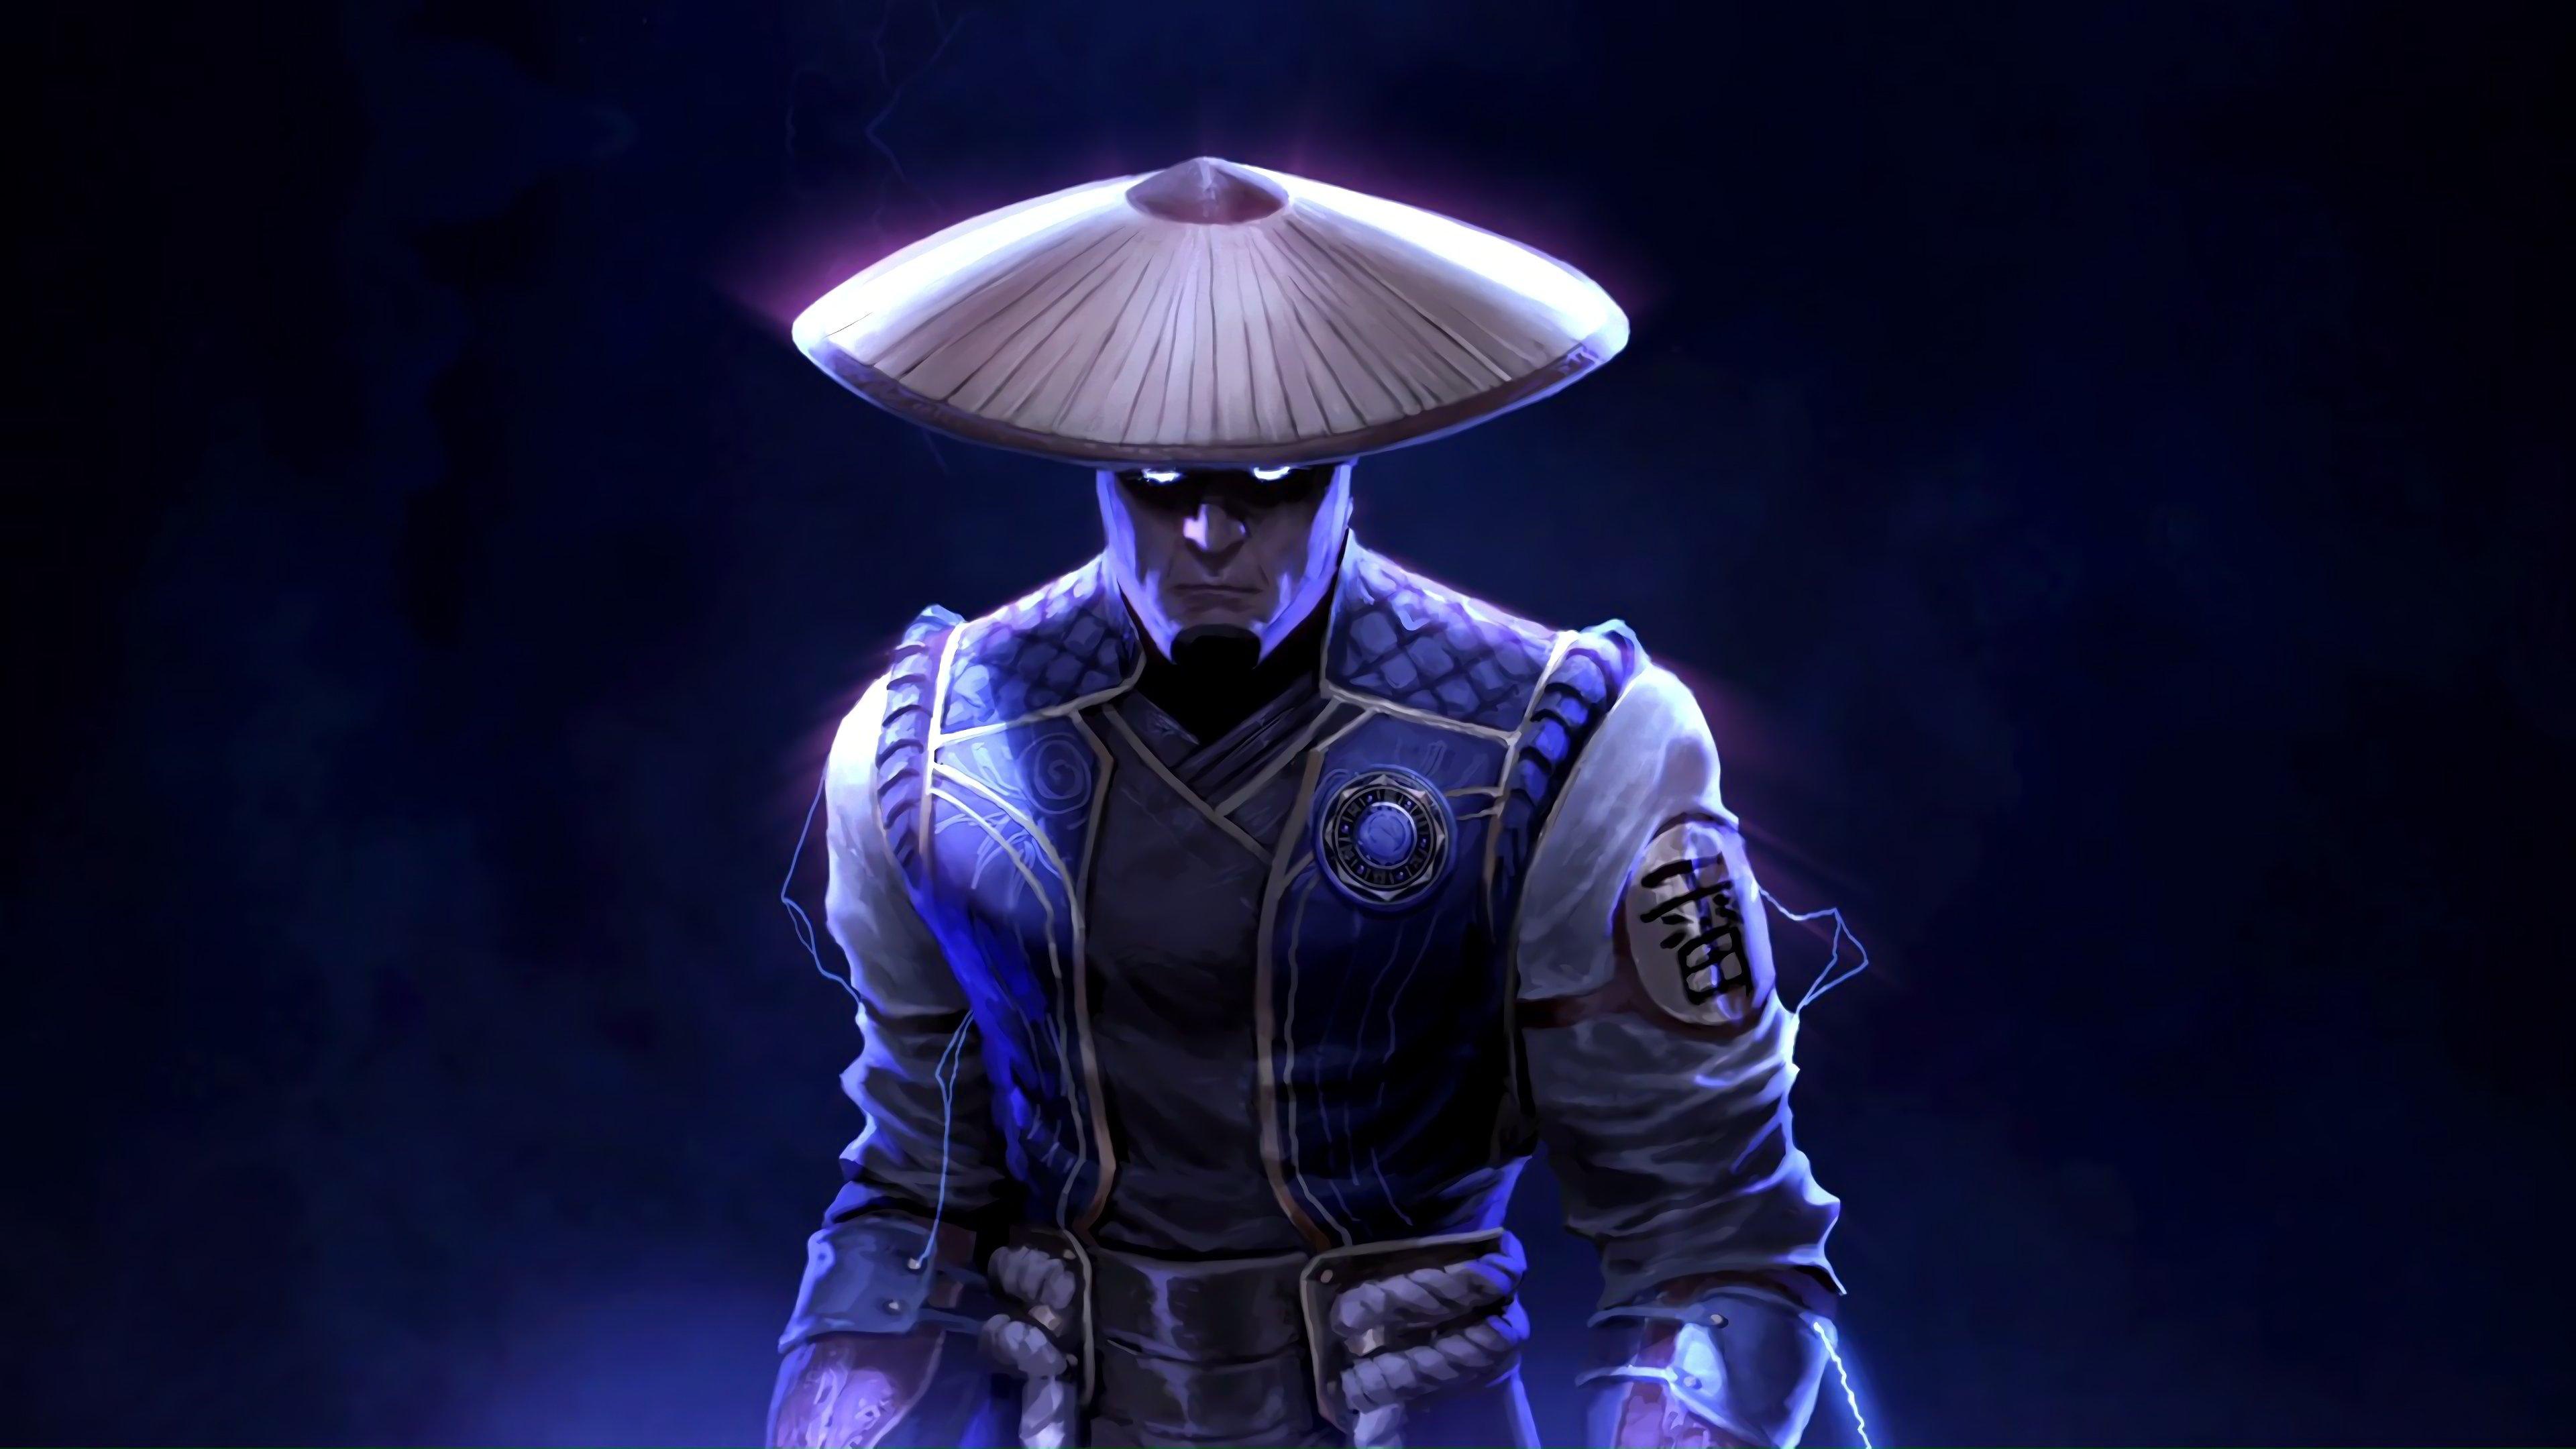 Fondos de pantalla Raiden de Mortal Kombat